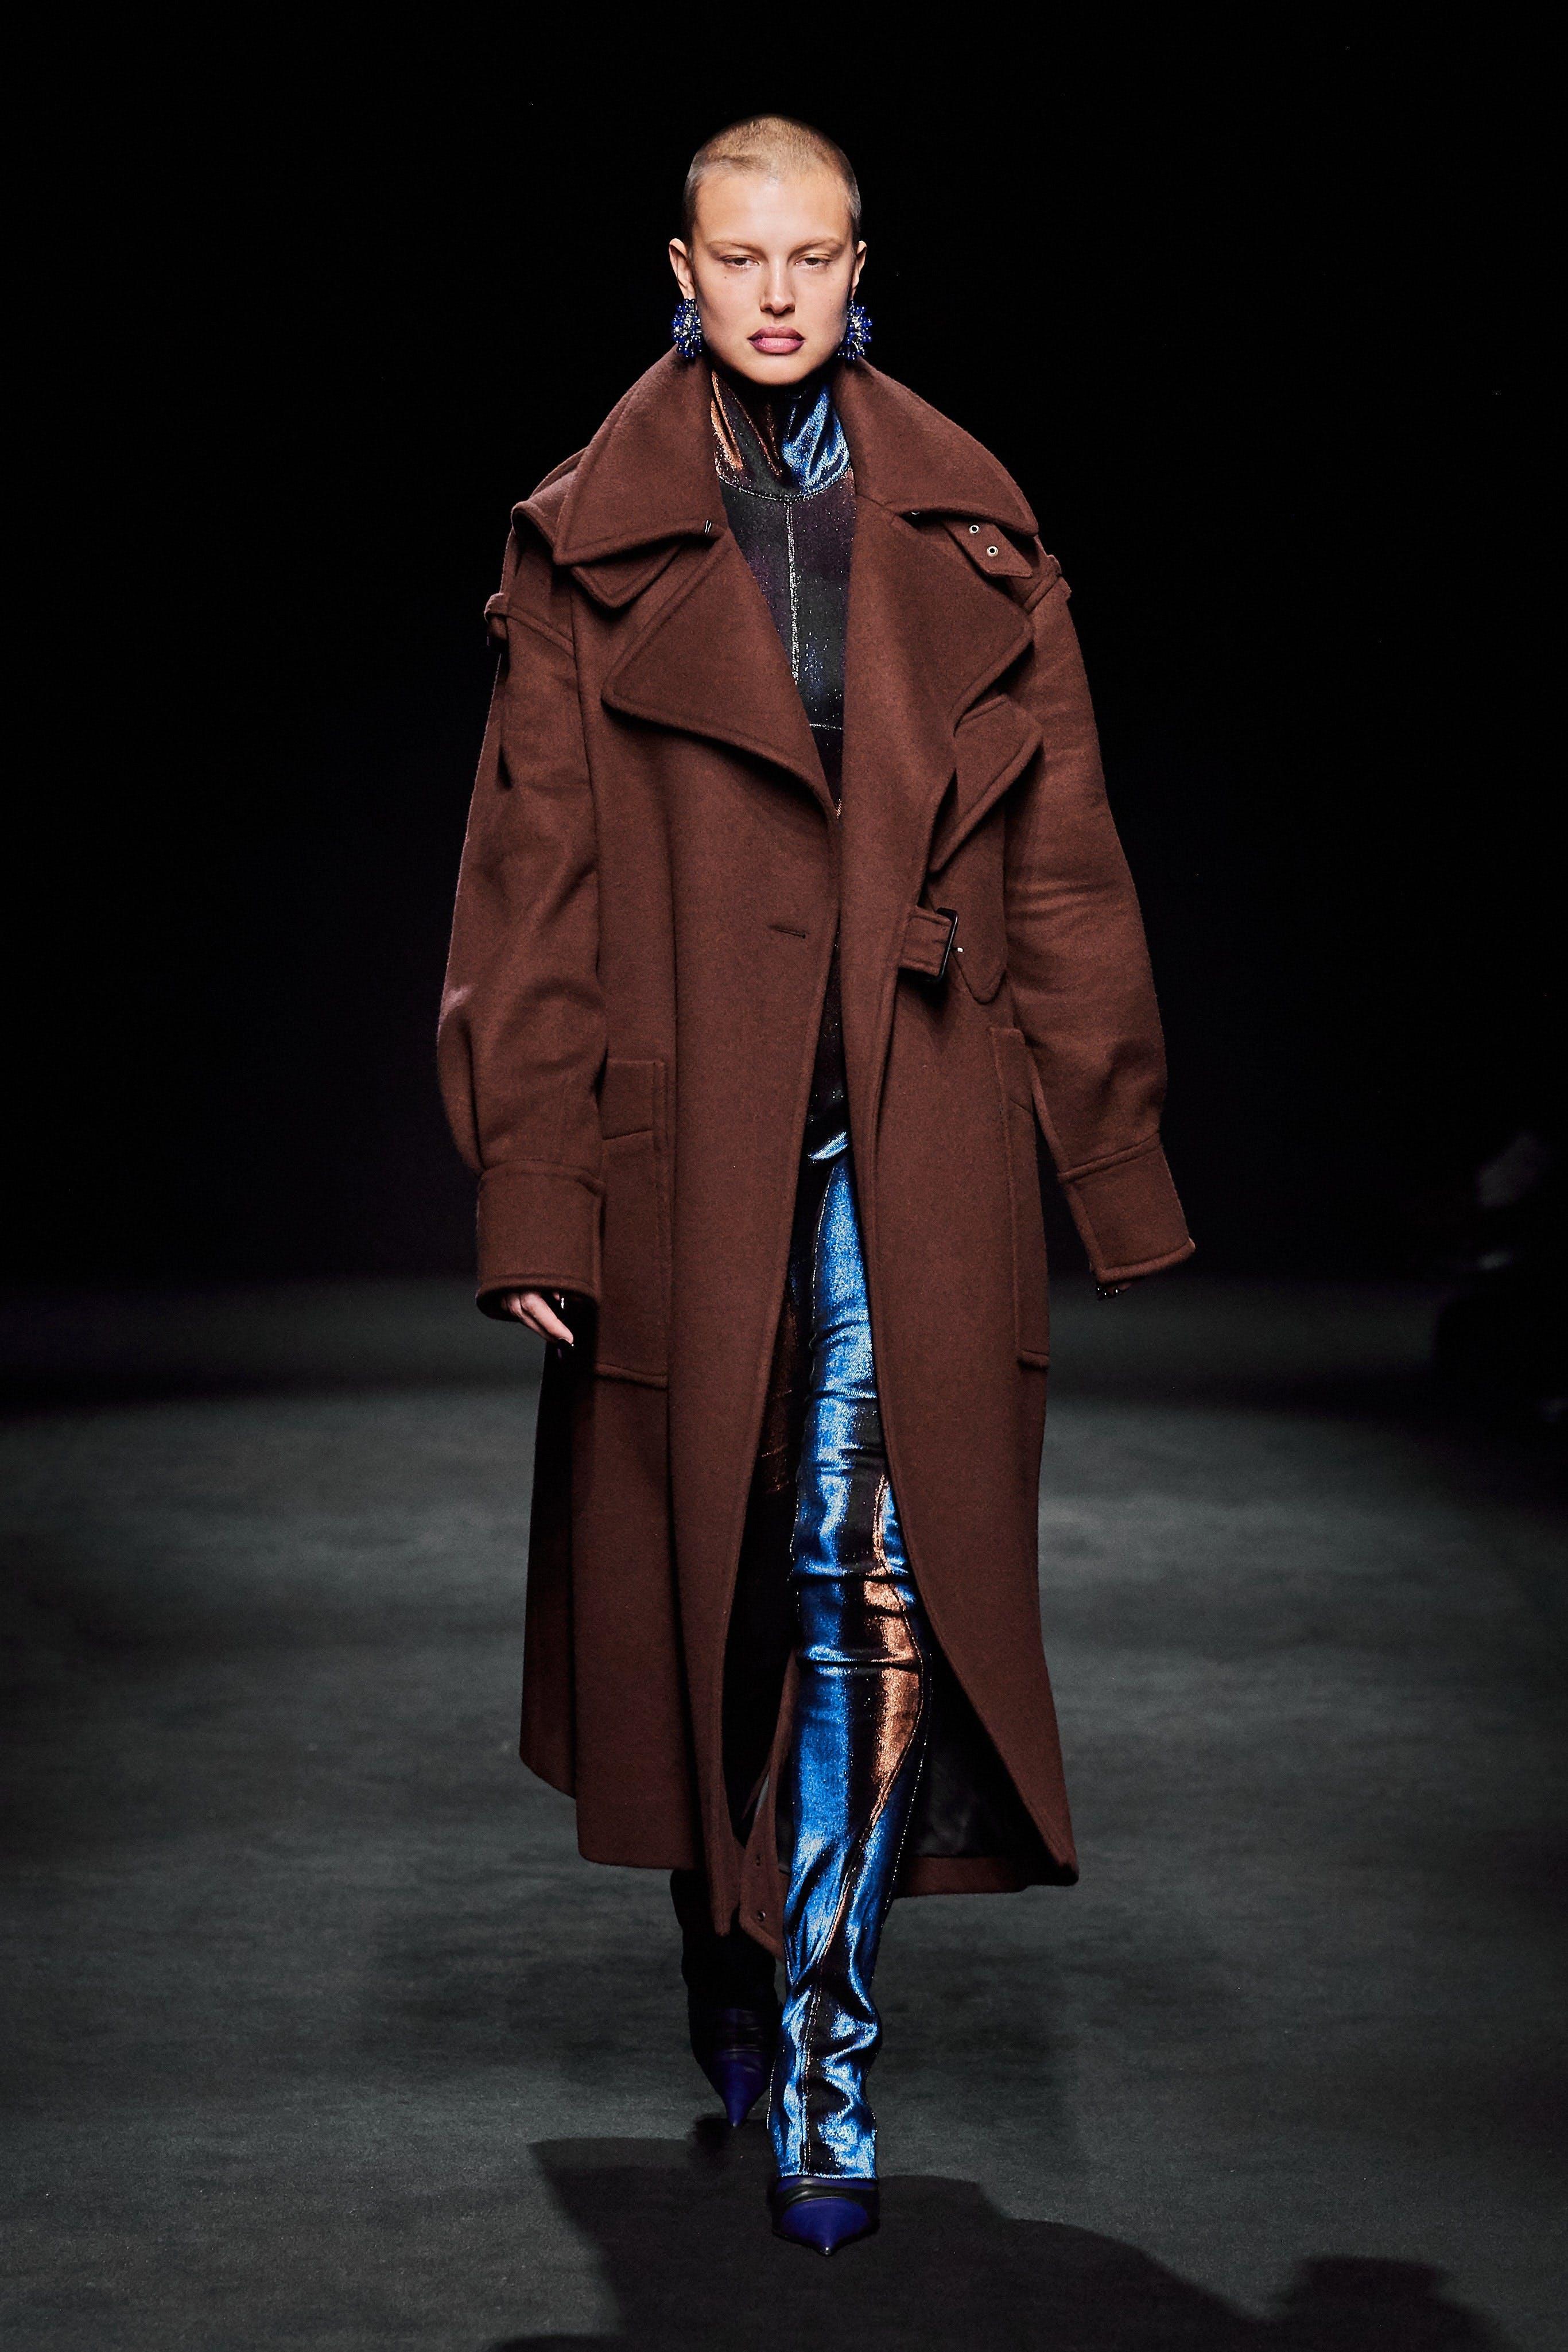 Mugler Runway Oversized Trench Coat in Brown Print Full Bodysuit Fall 20